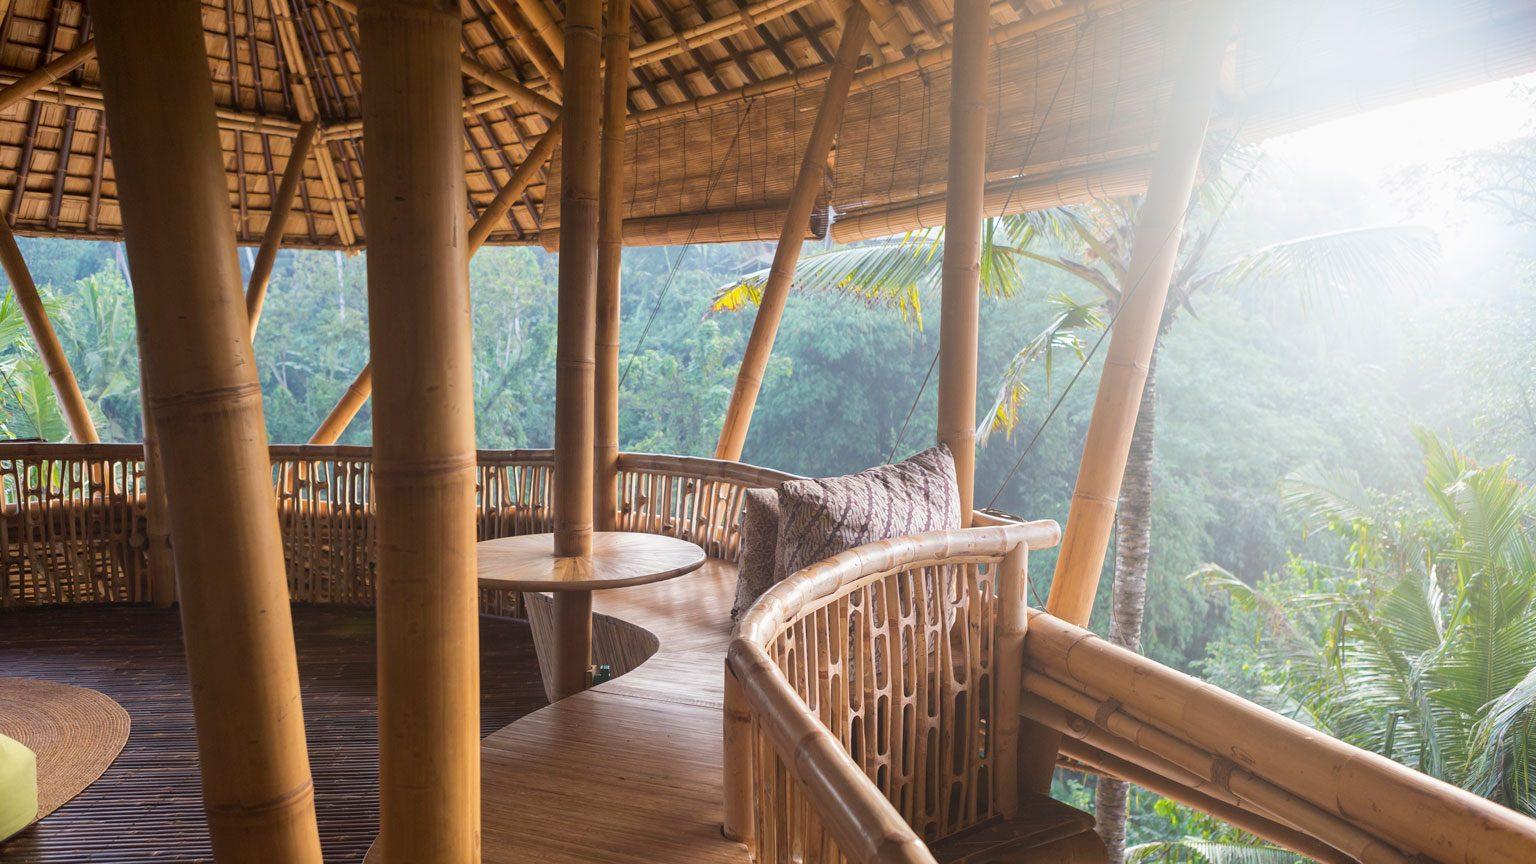 Bamboo hotel patio, Ubud, Bali, Indonesia